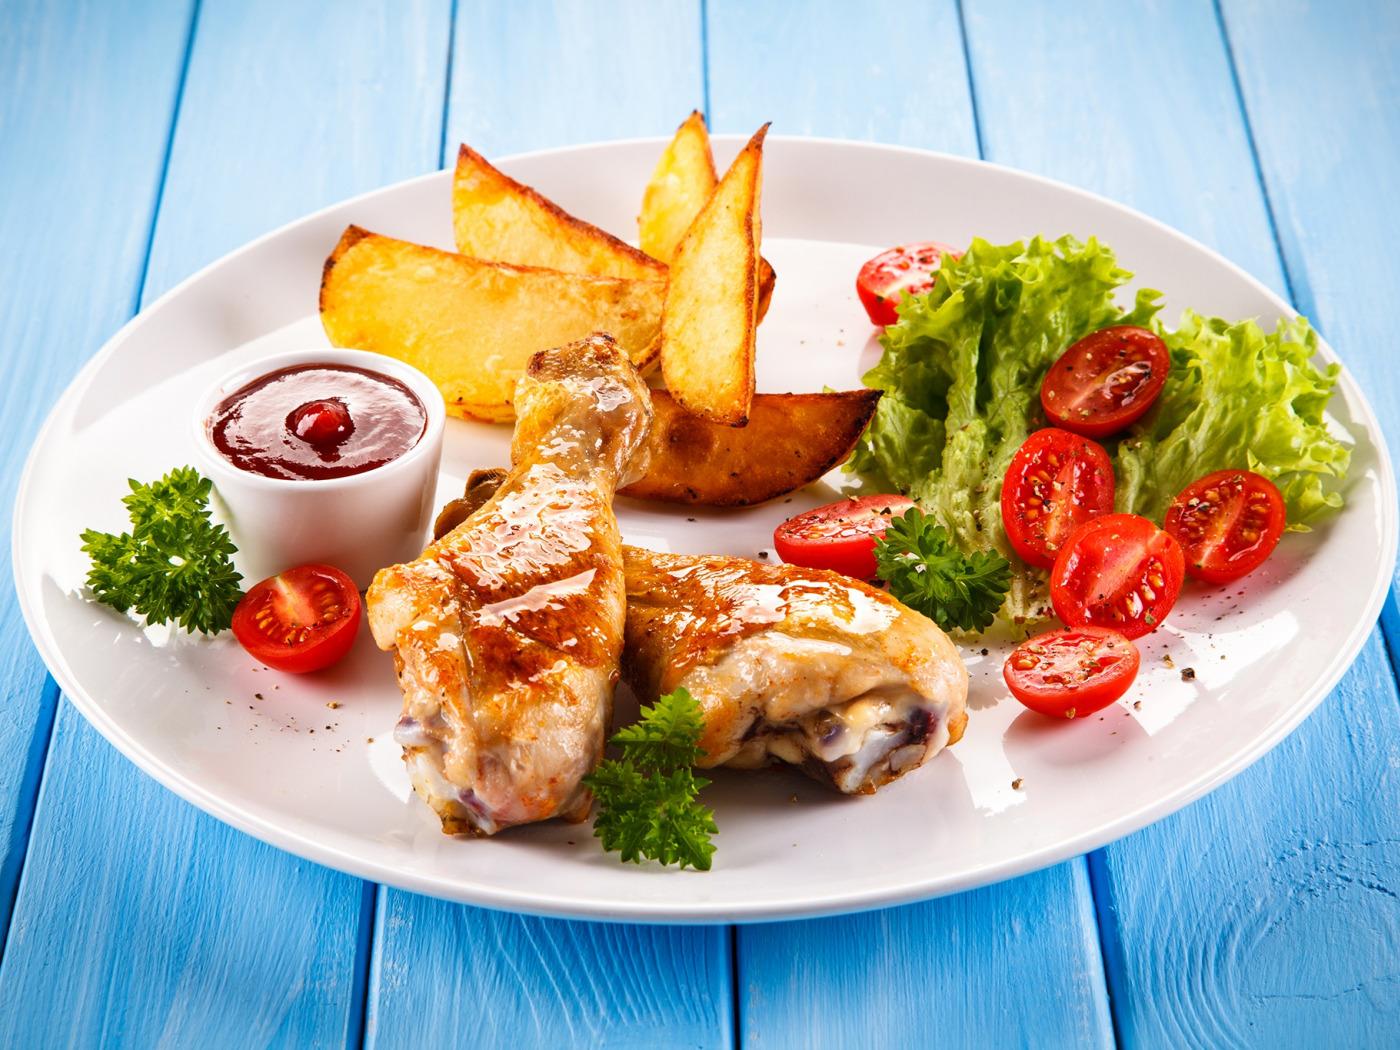 блюда из курицы картинки для меню